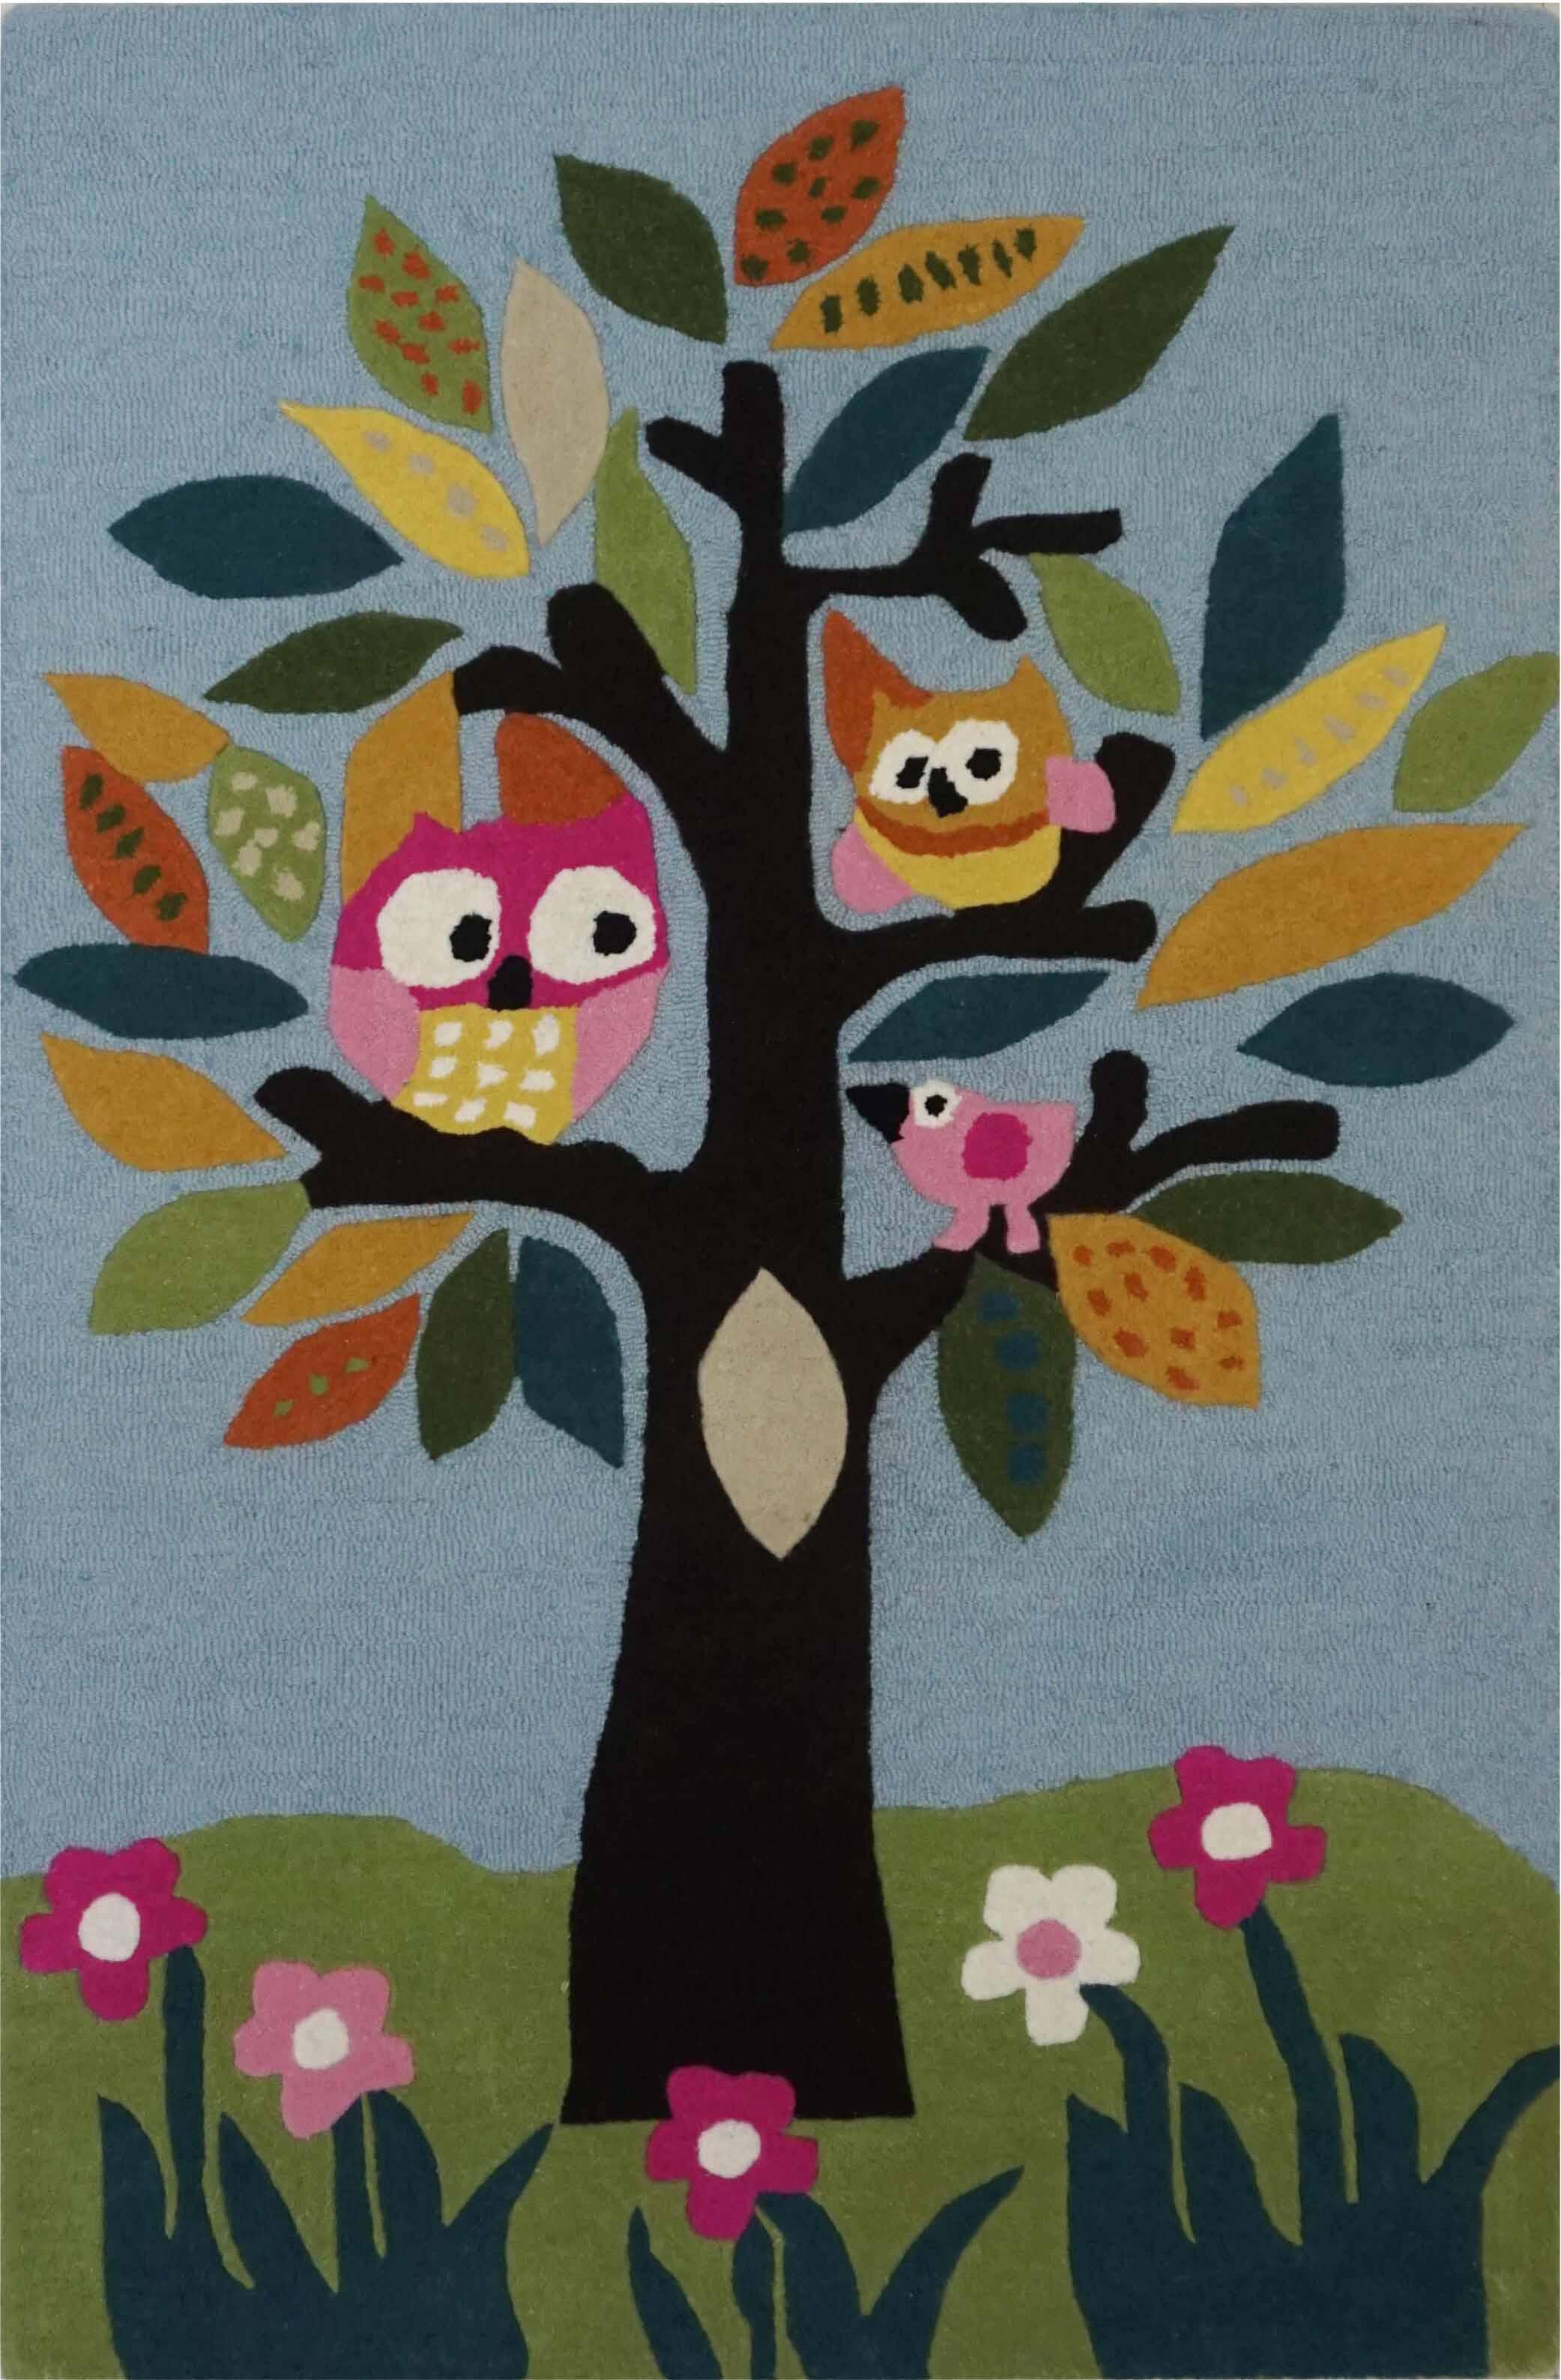 KIDS ANGRY BIRD